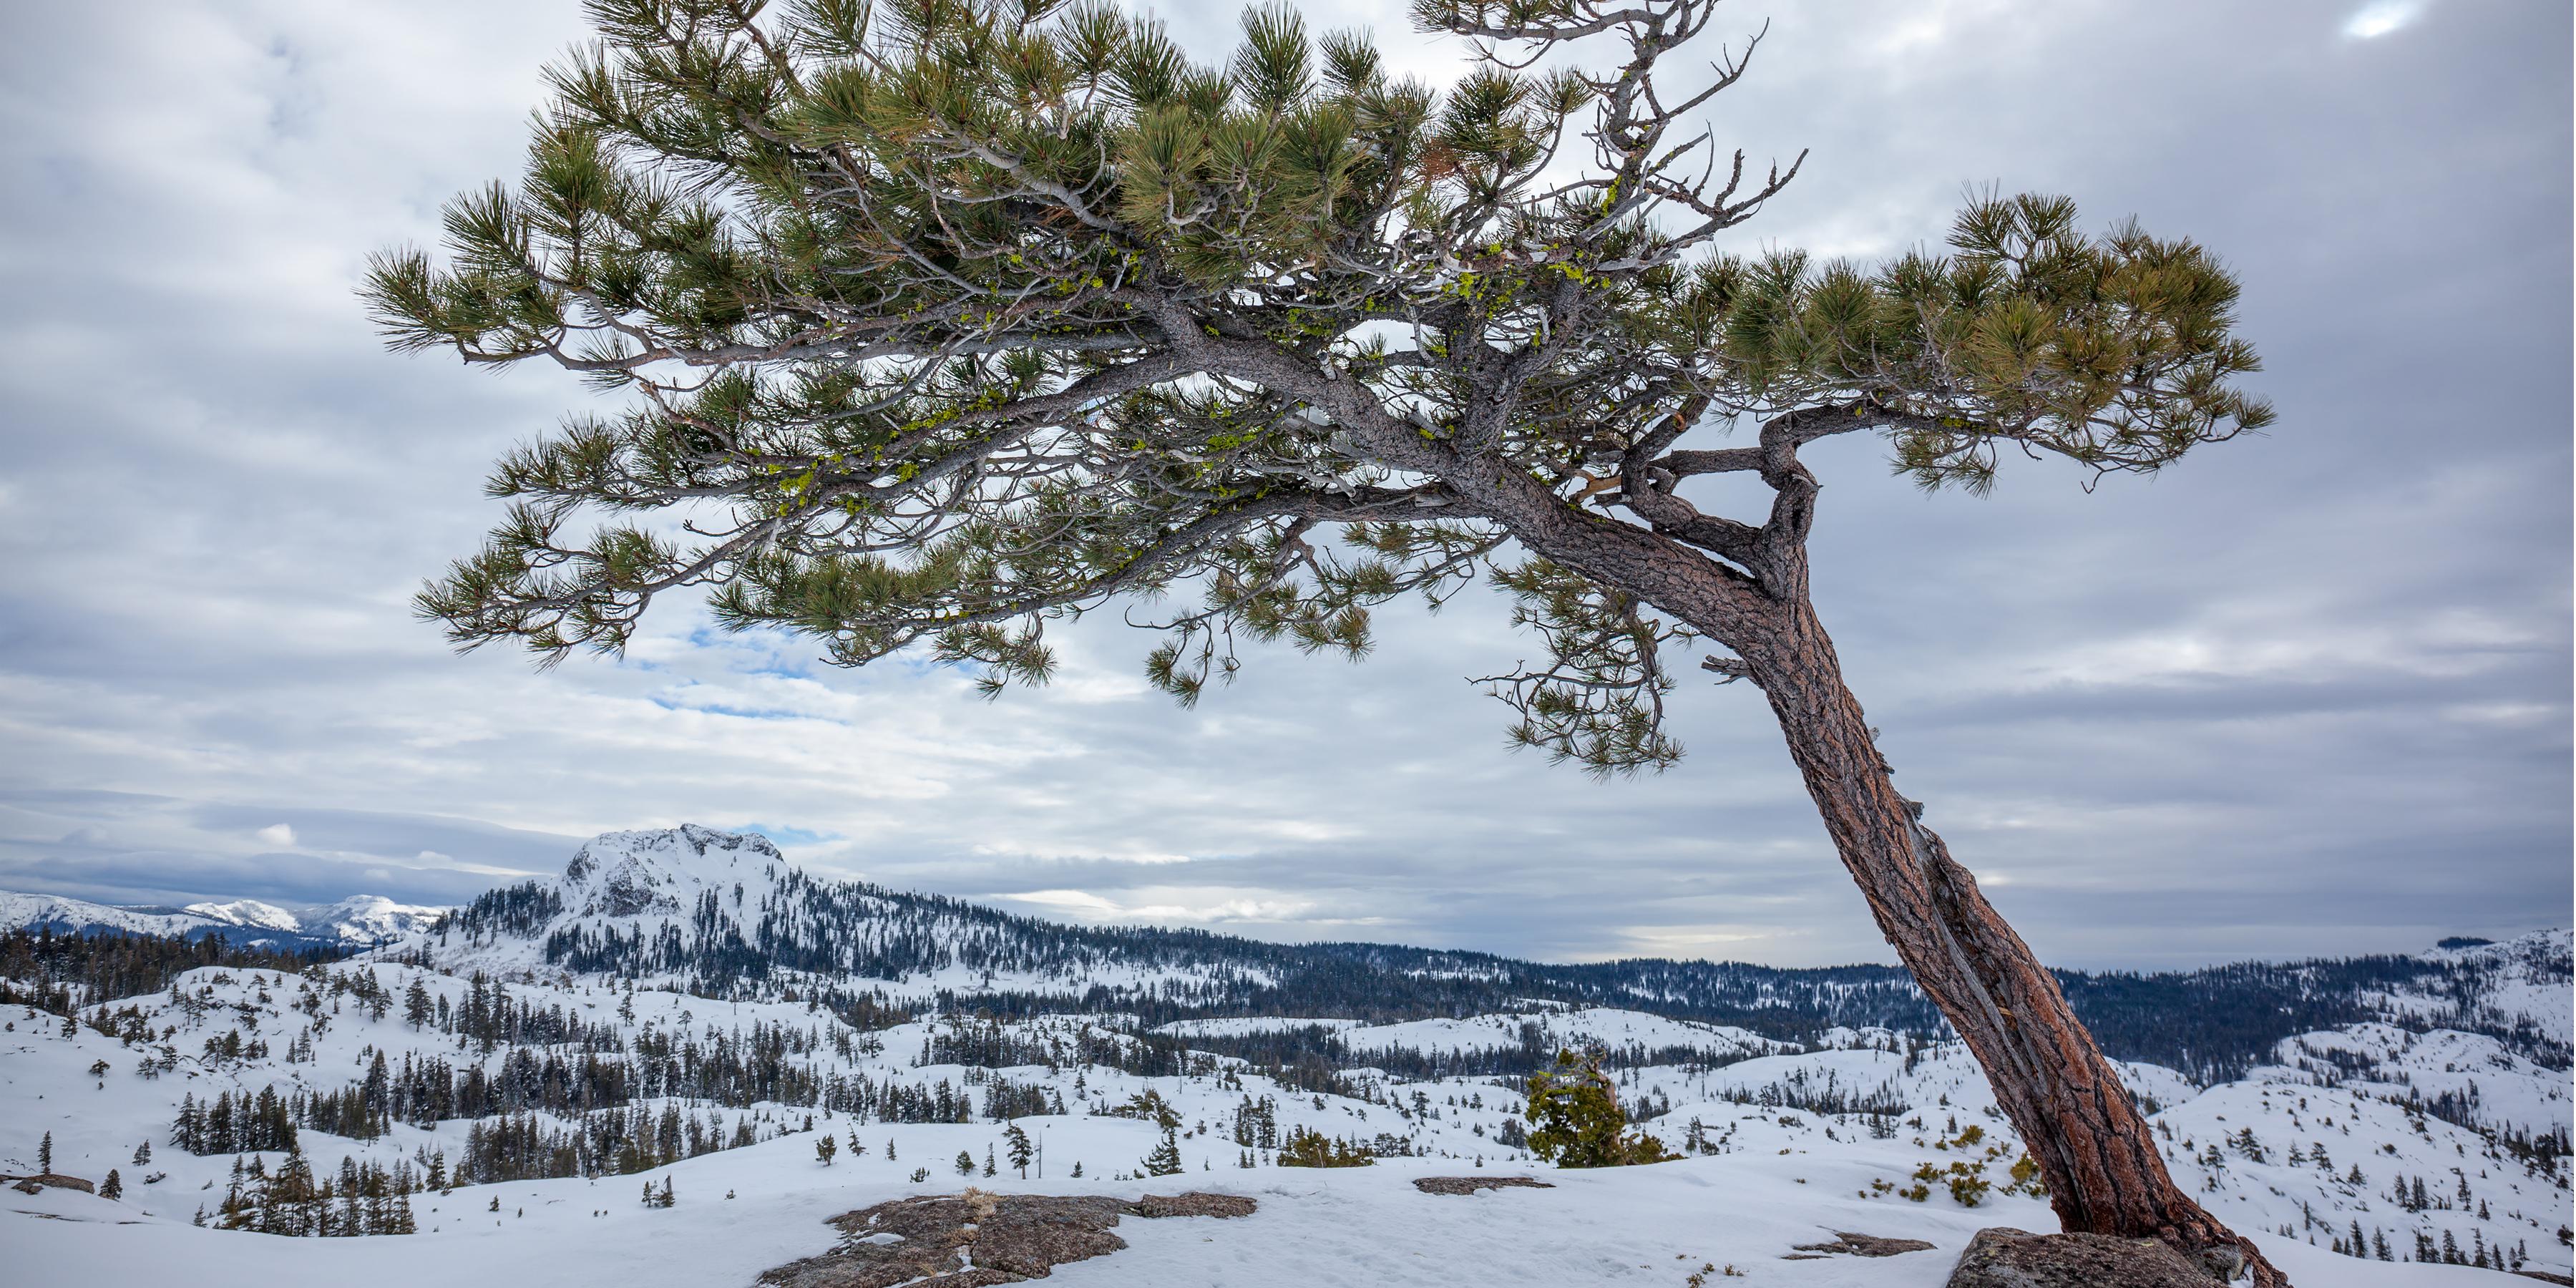 Matrimony Tree Snowshoe Snowshoeing In California